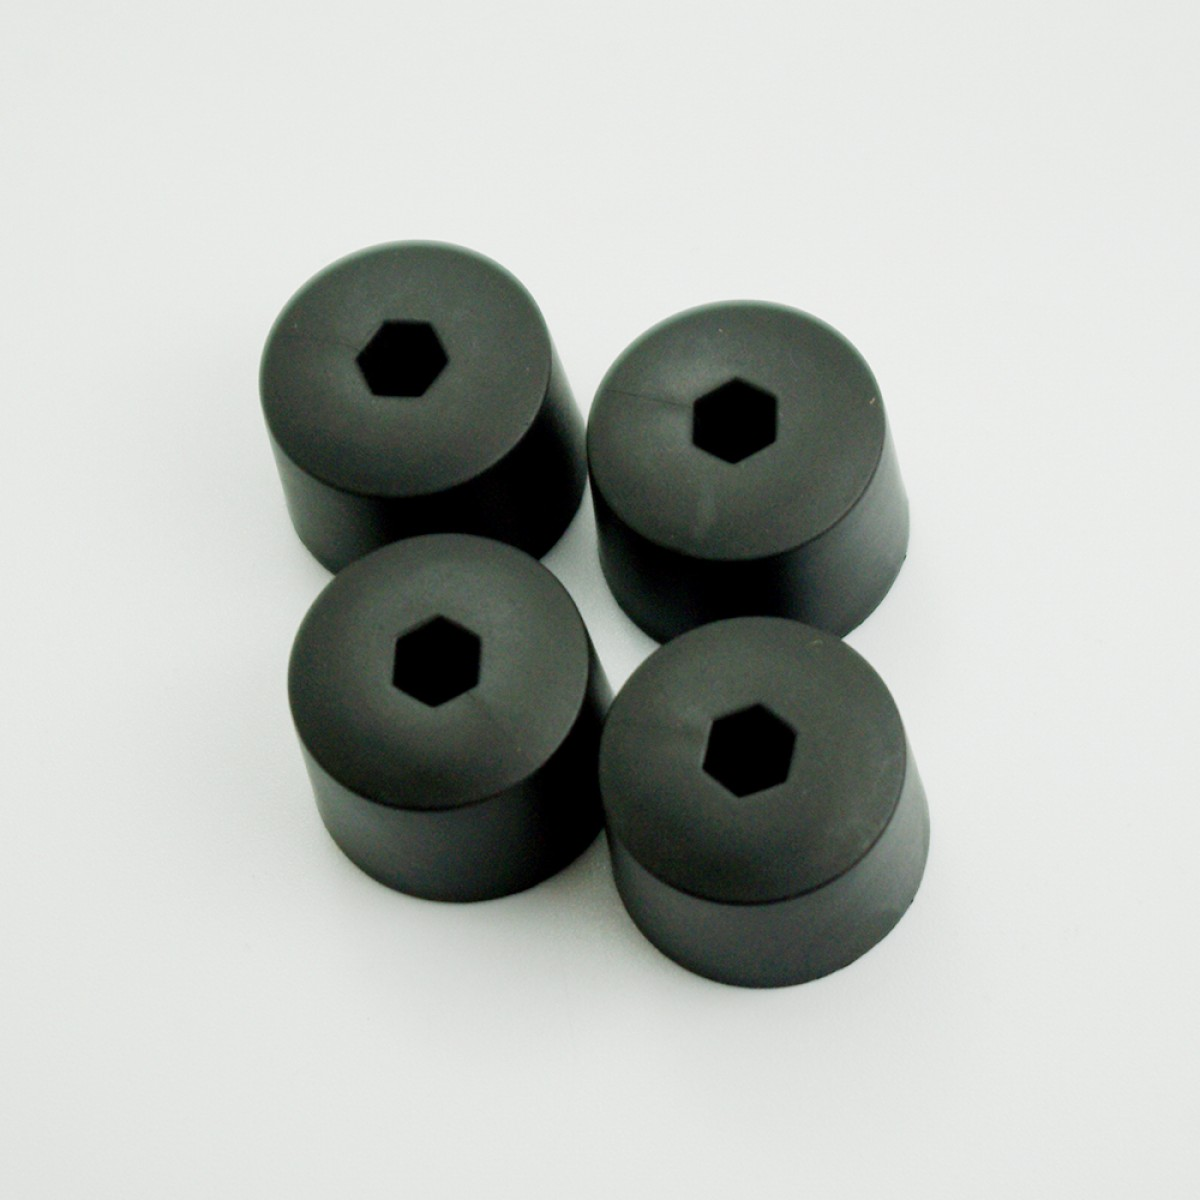 17mm Lug Bolt Cap - Priced Each